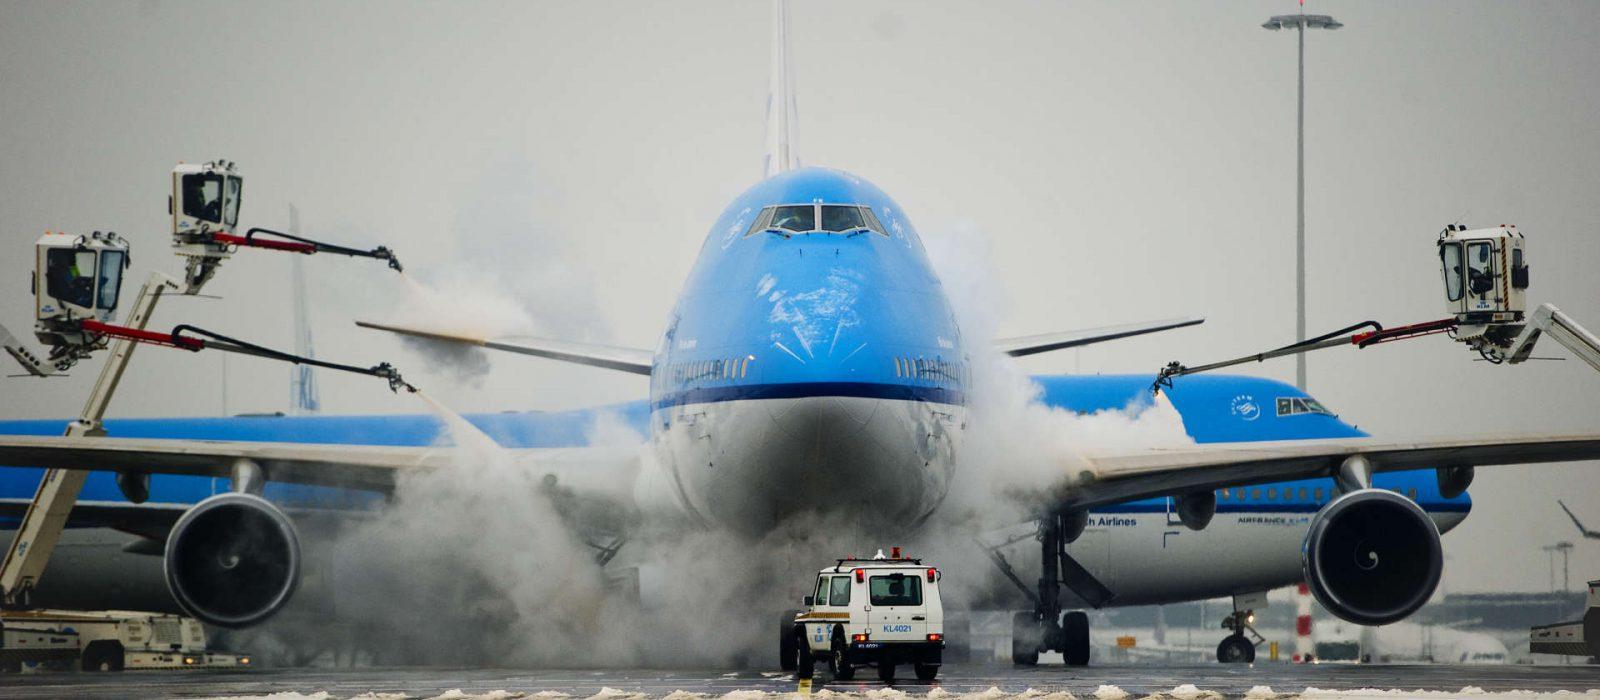 De-icing of Plane